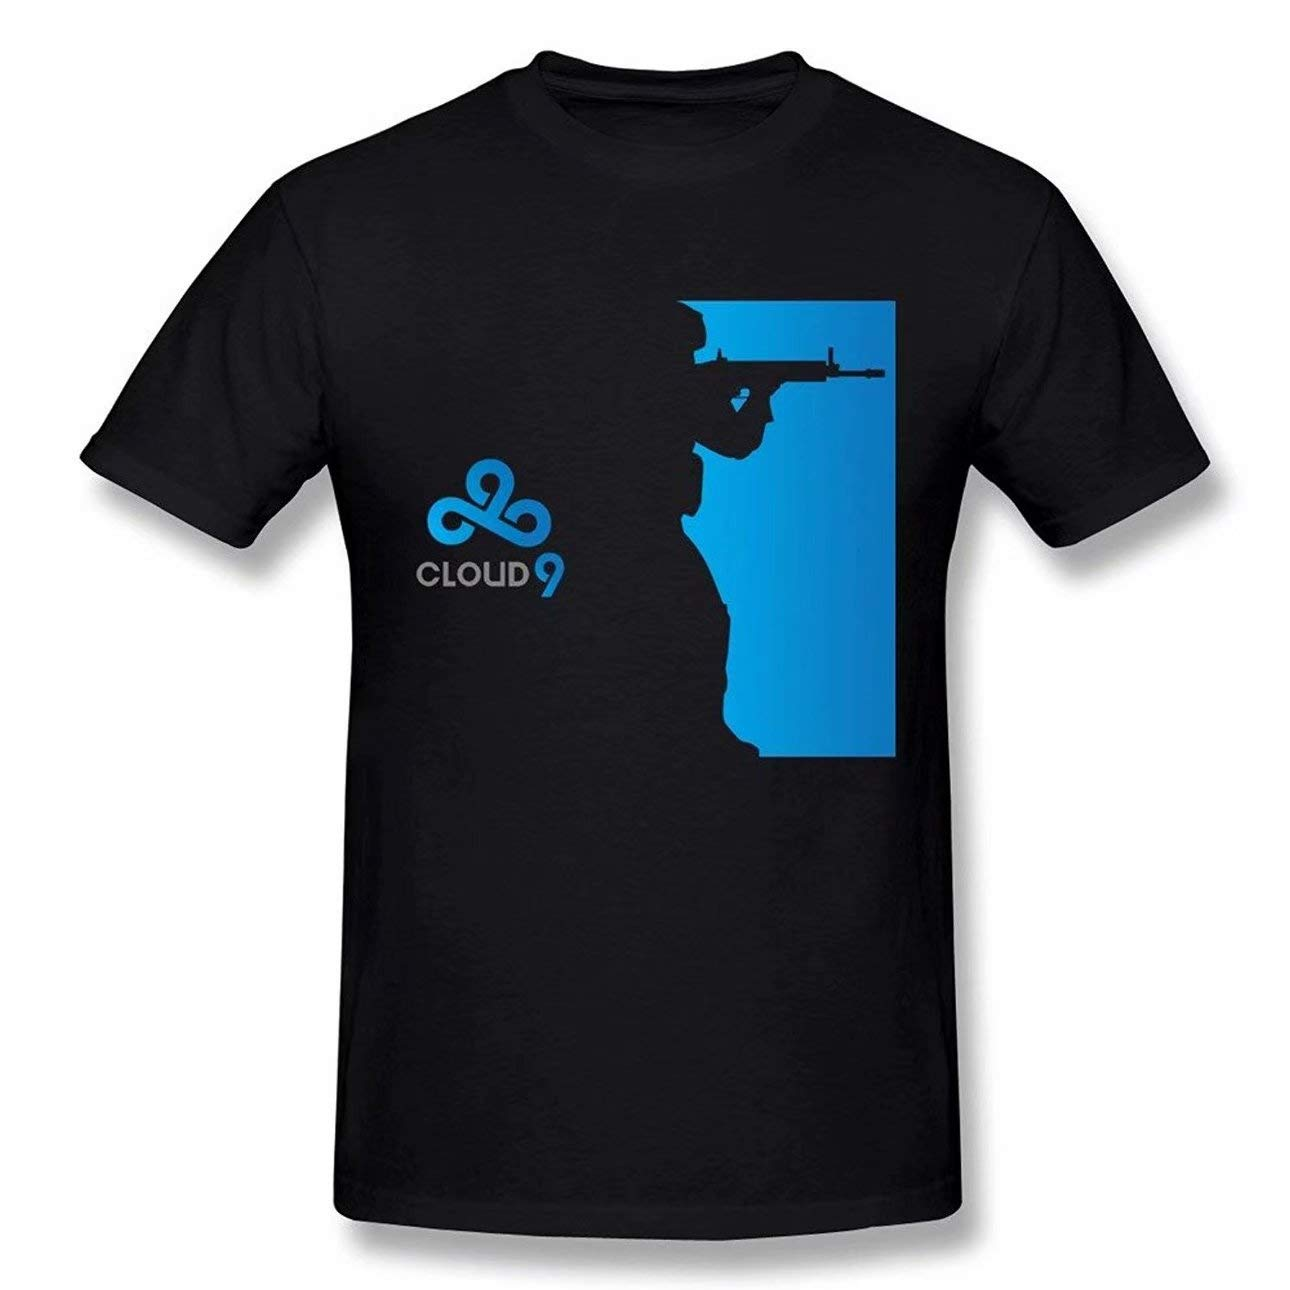 Depeal S Funny Tee Cloud 9 Gaming Csgo Lol Logo T Shirt